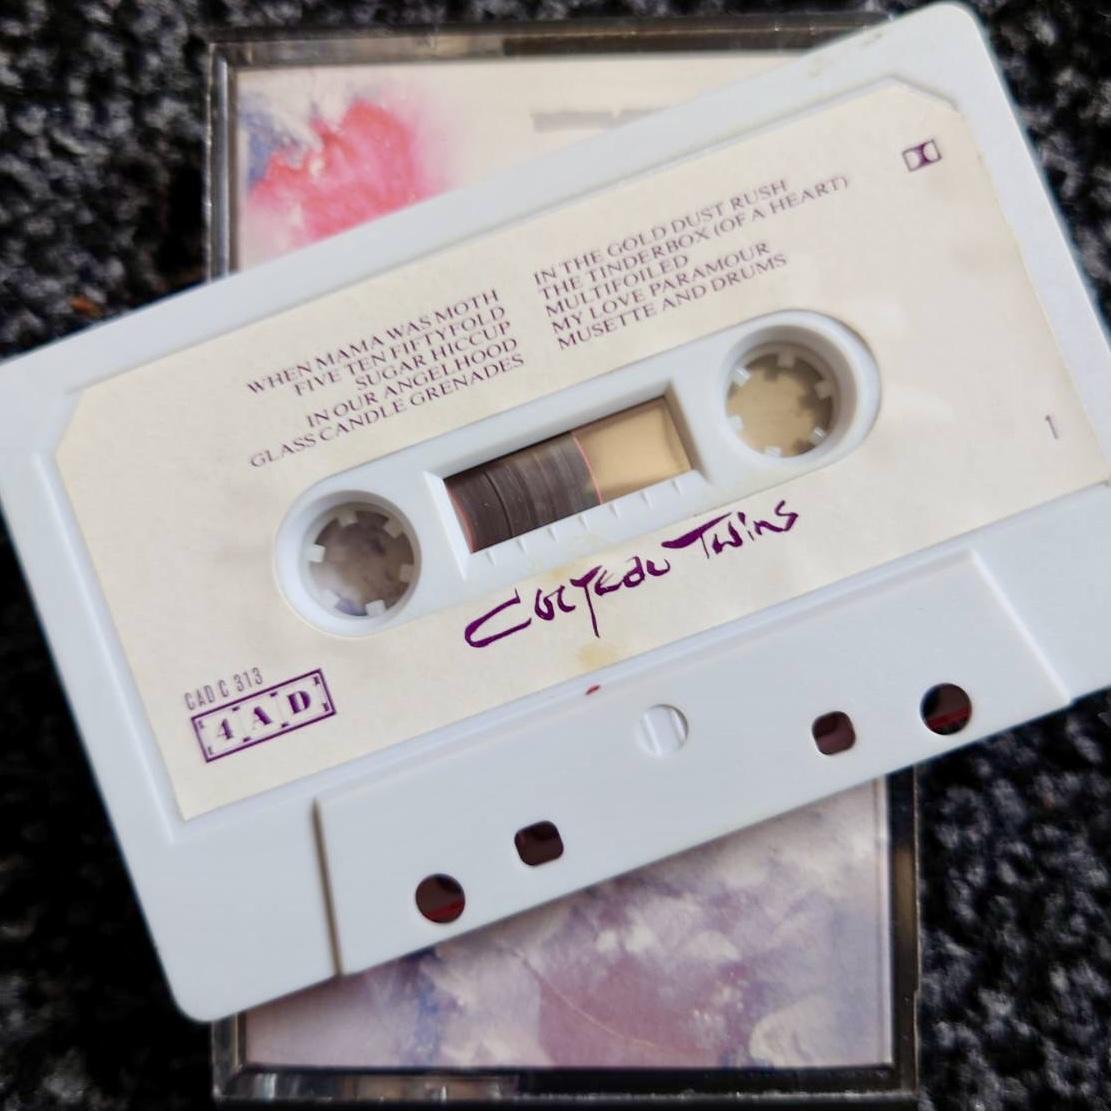 Cocteau Twins 'Head Over Heels' / 'Sunburst and Snowblind' 1983 UK cassette side one